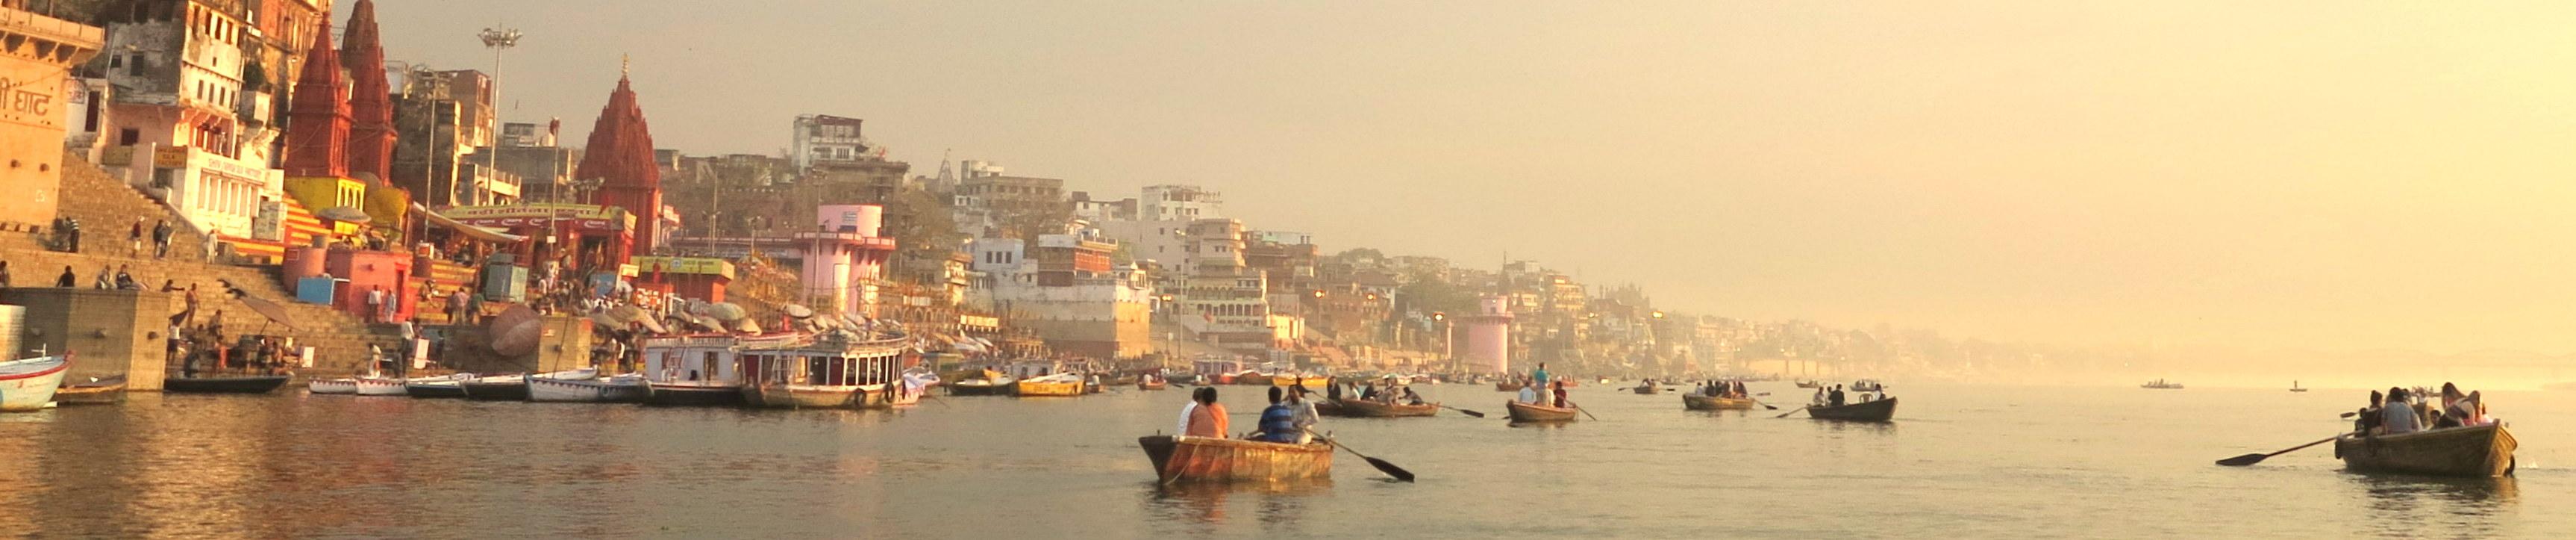 Yoga Kamla na Índia